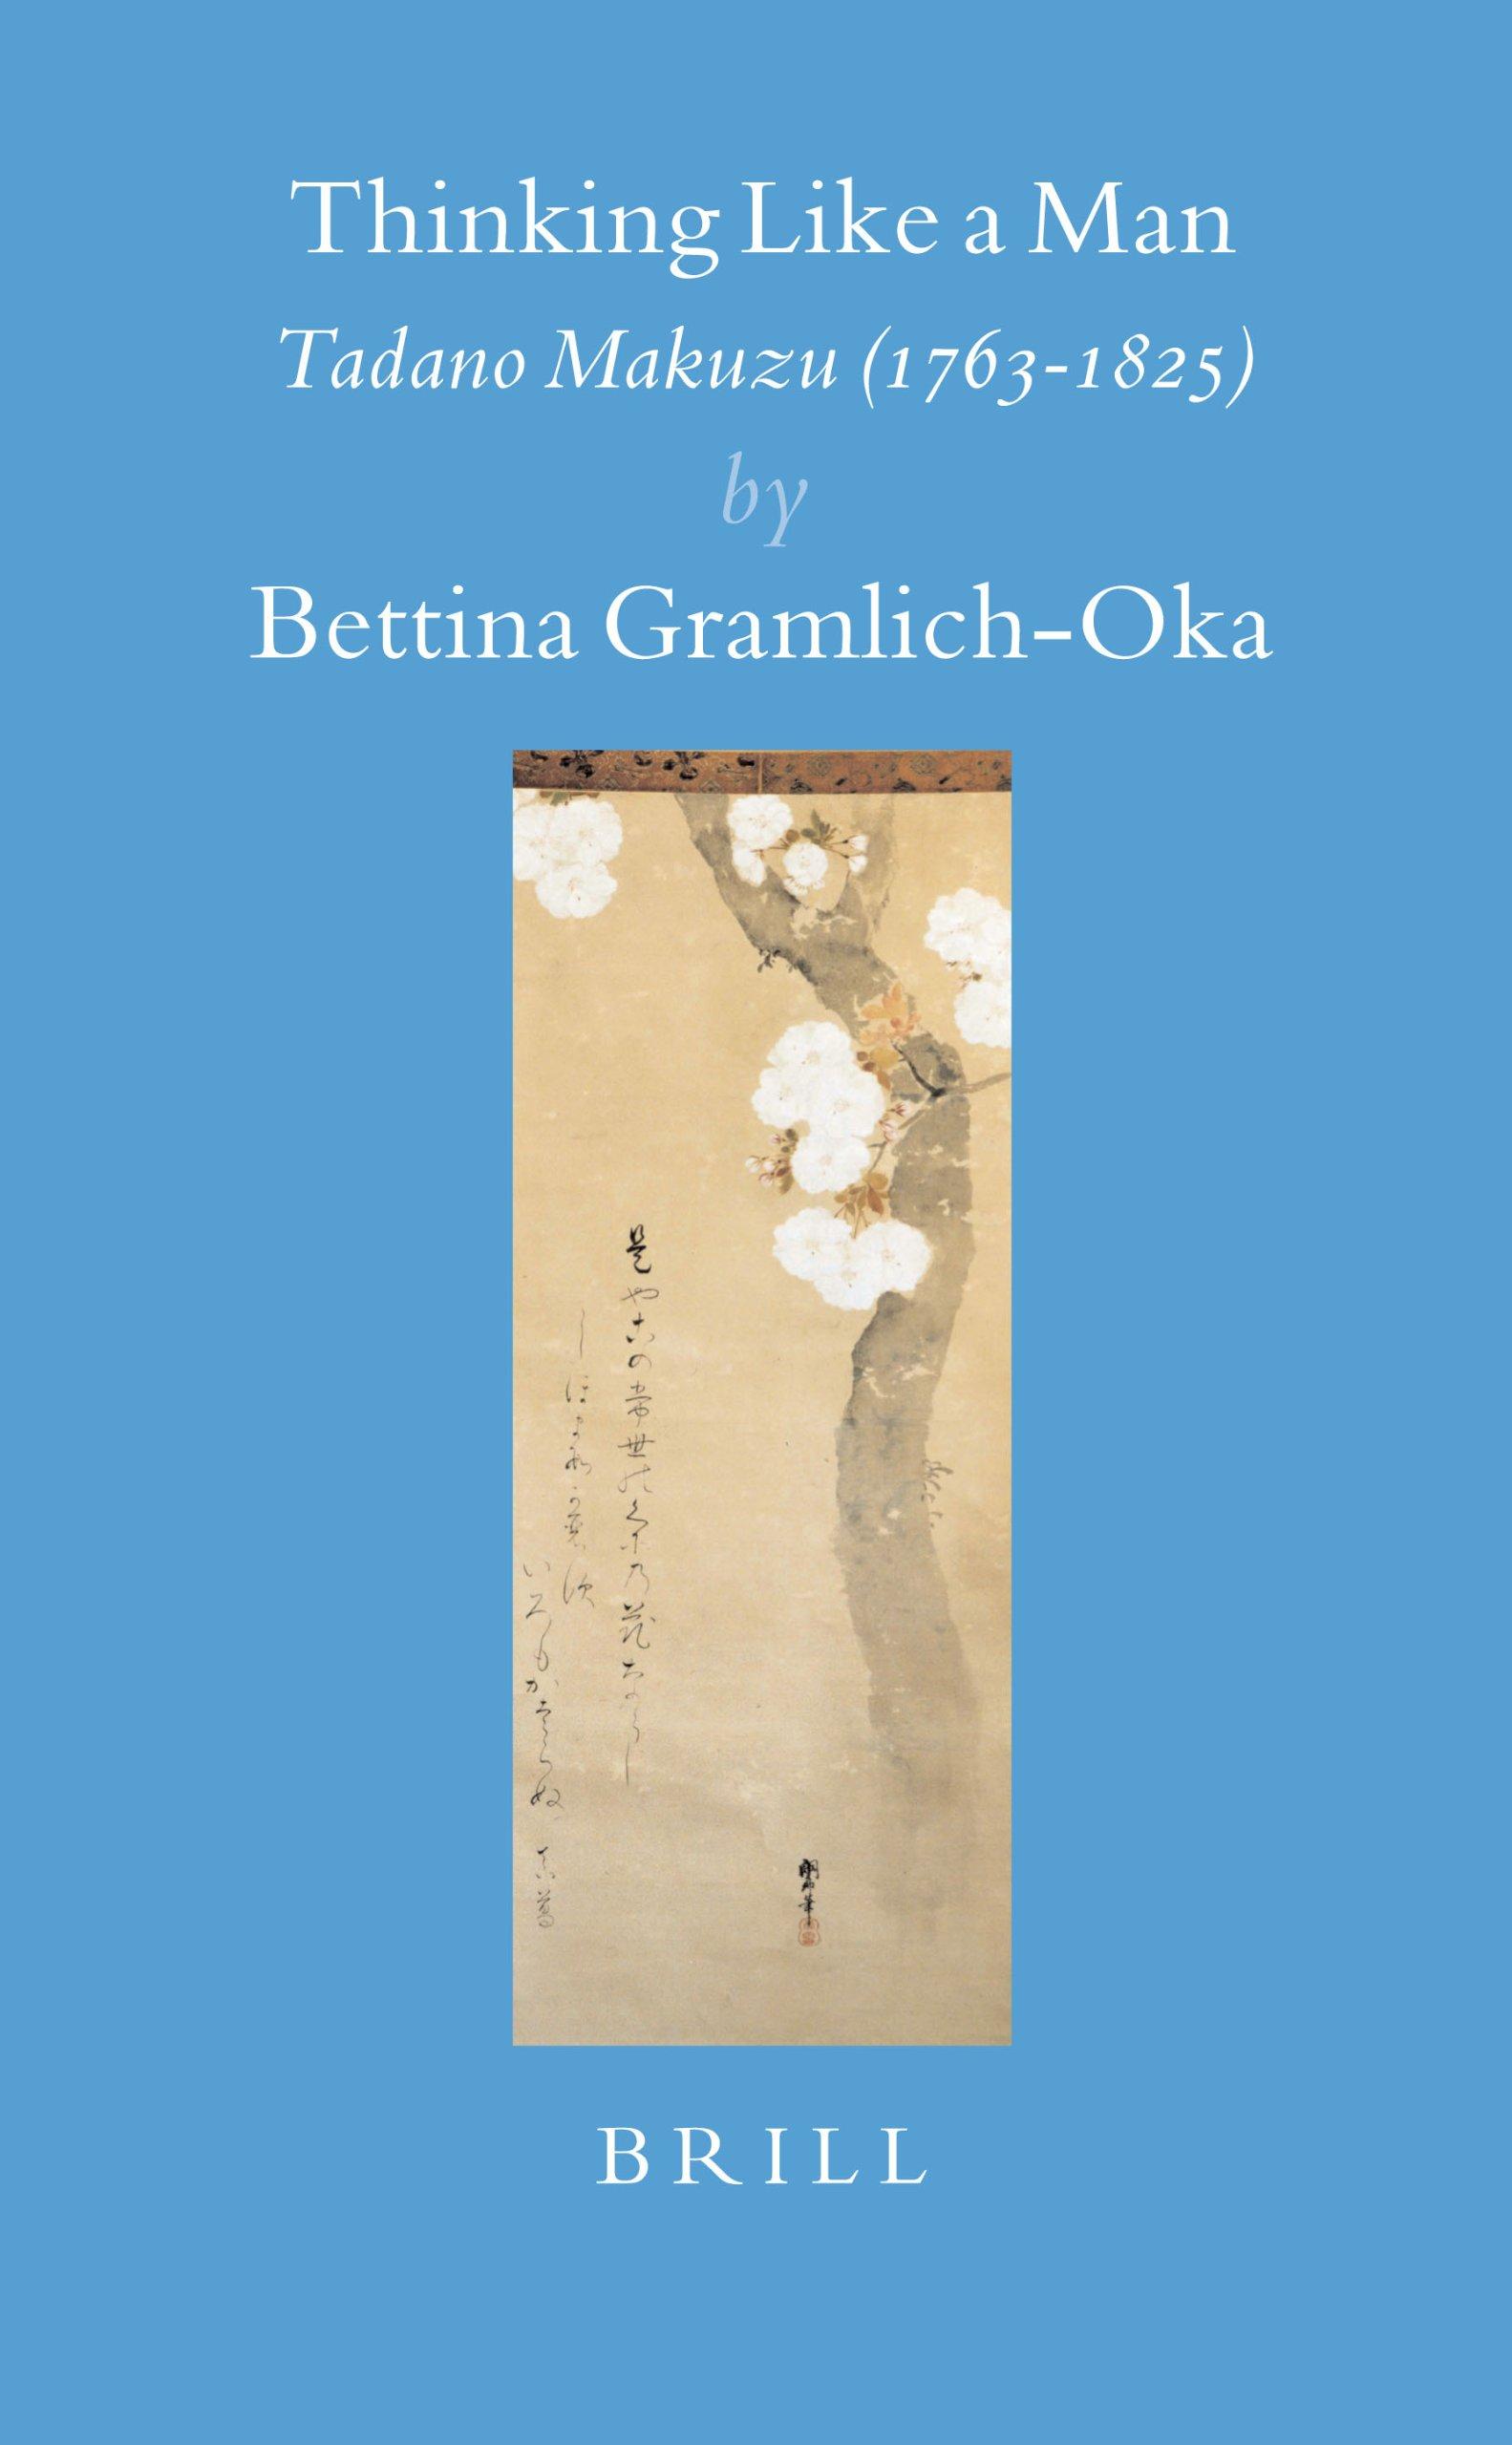 Thinking Like a Man: Tadano Makuzu (1763-1825) (Brill's Japanese Studies Library) PDF